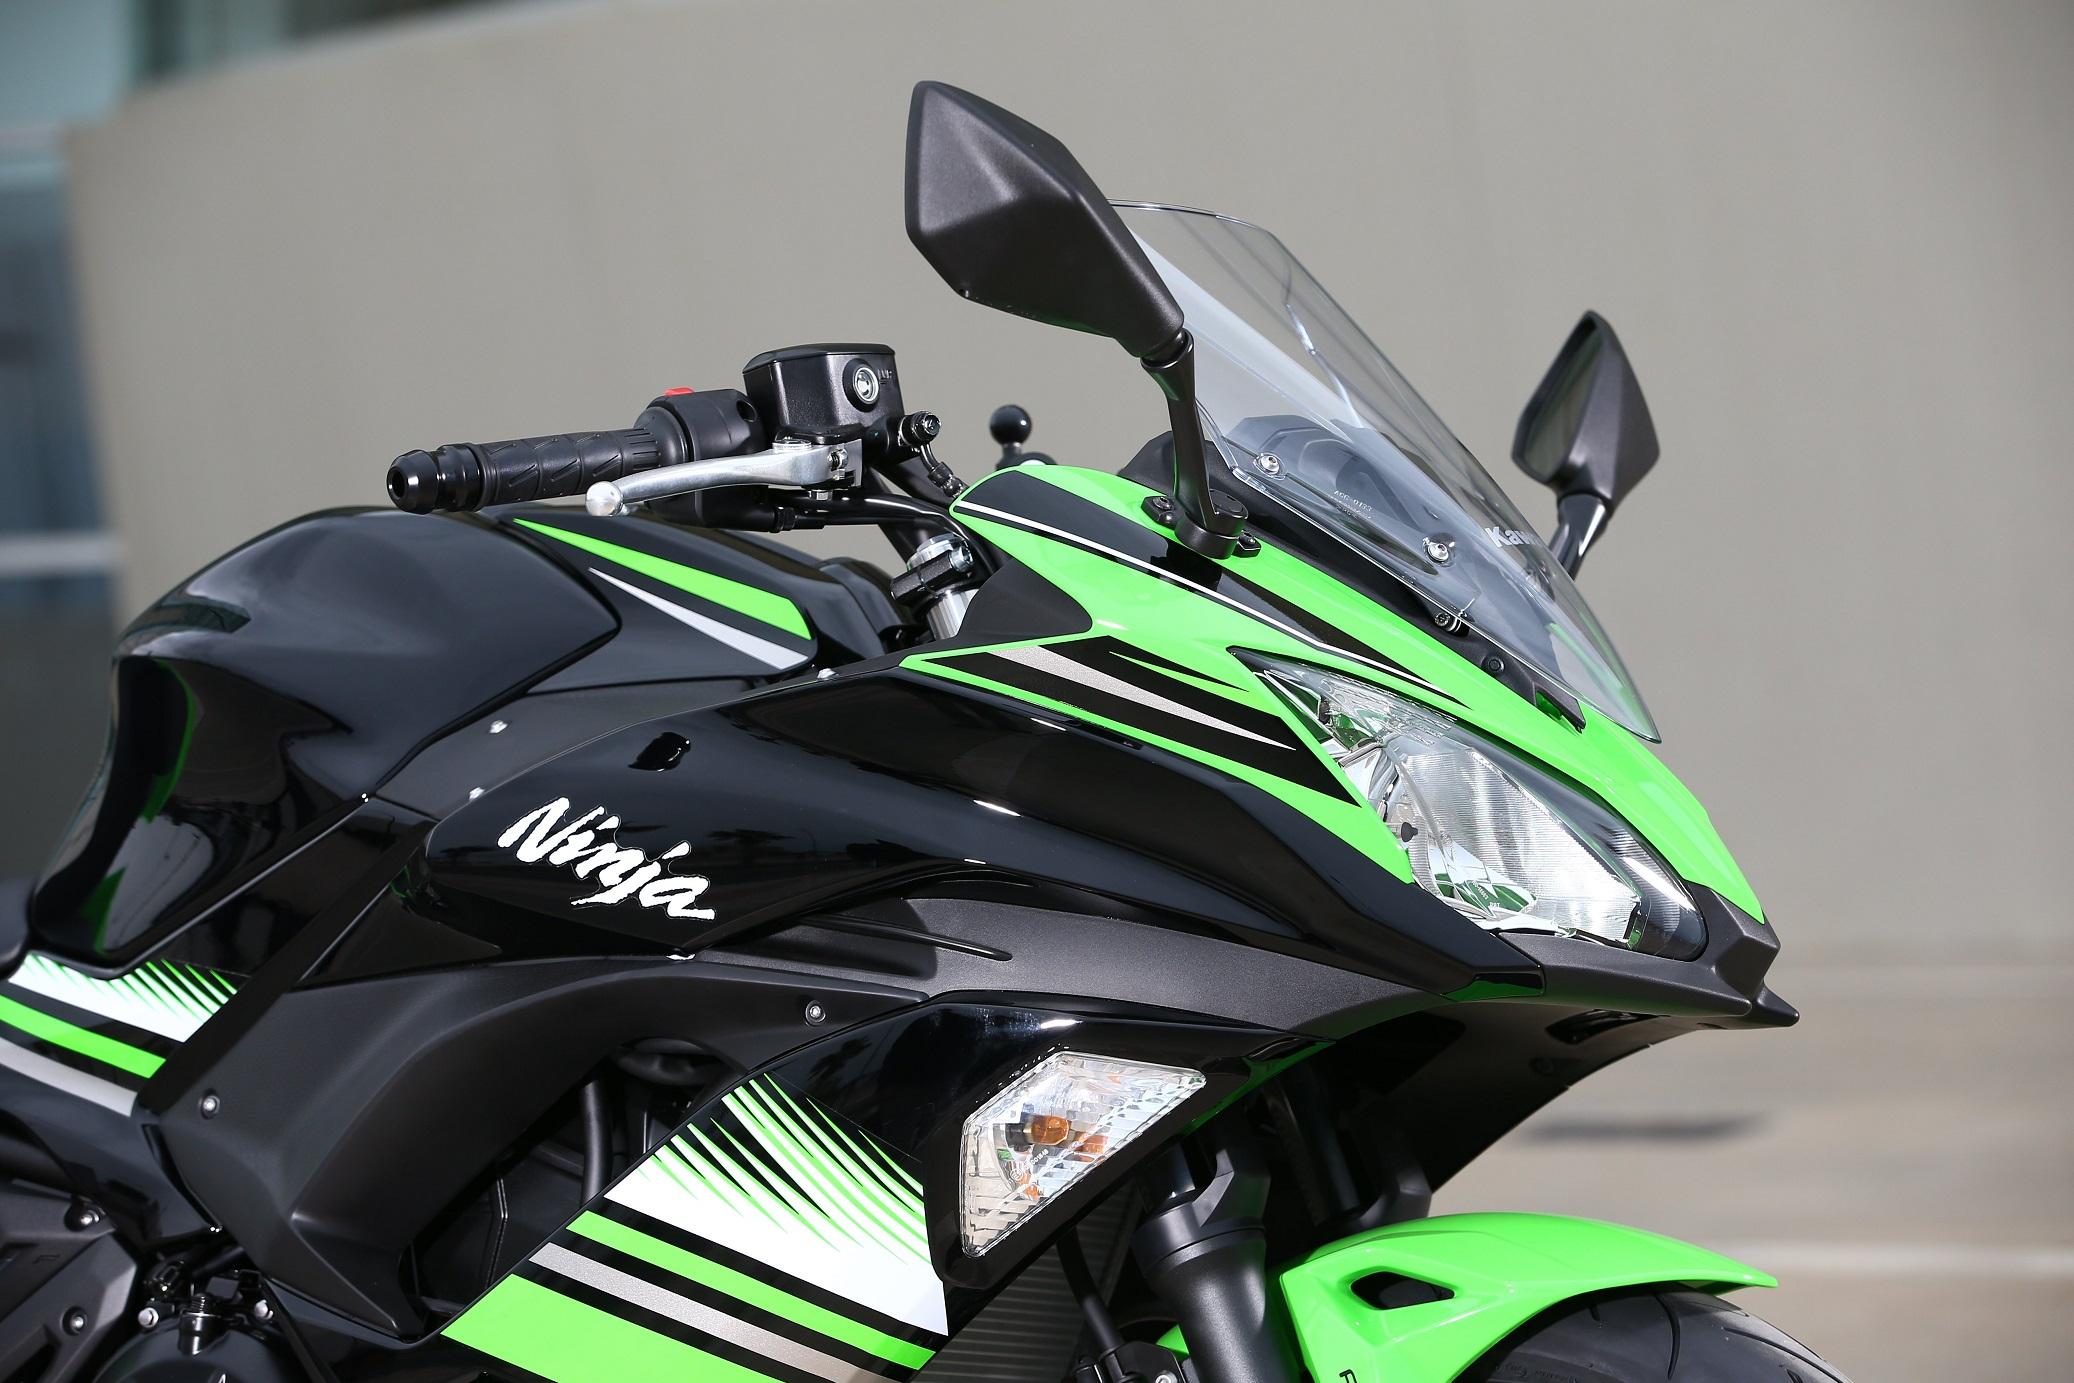 Kawasaki Ninja 650 styling